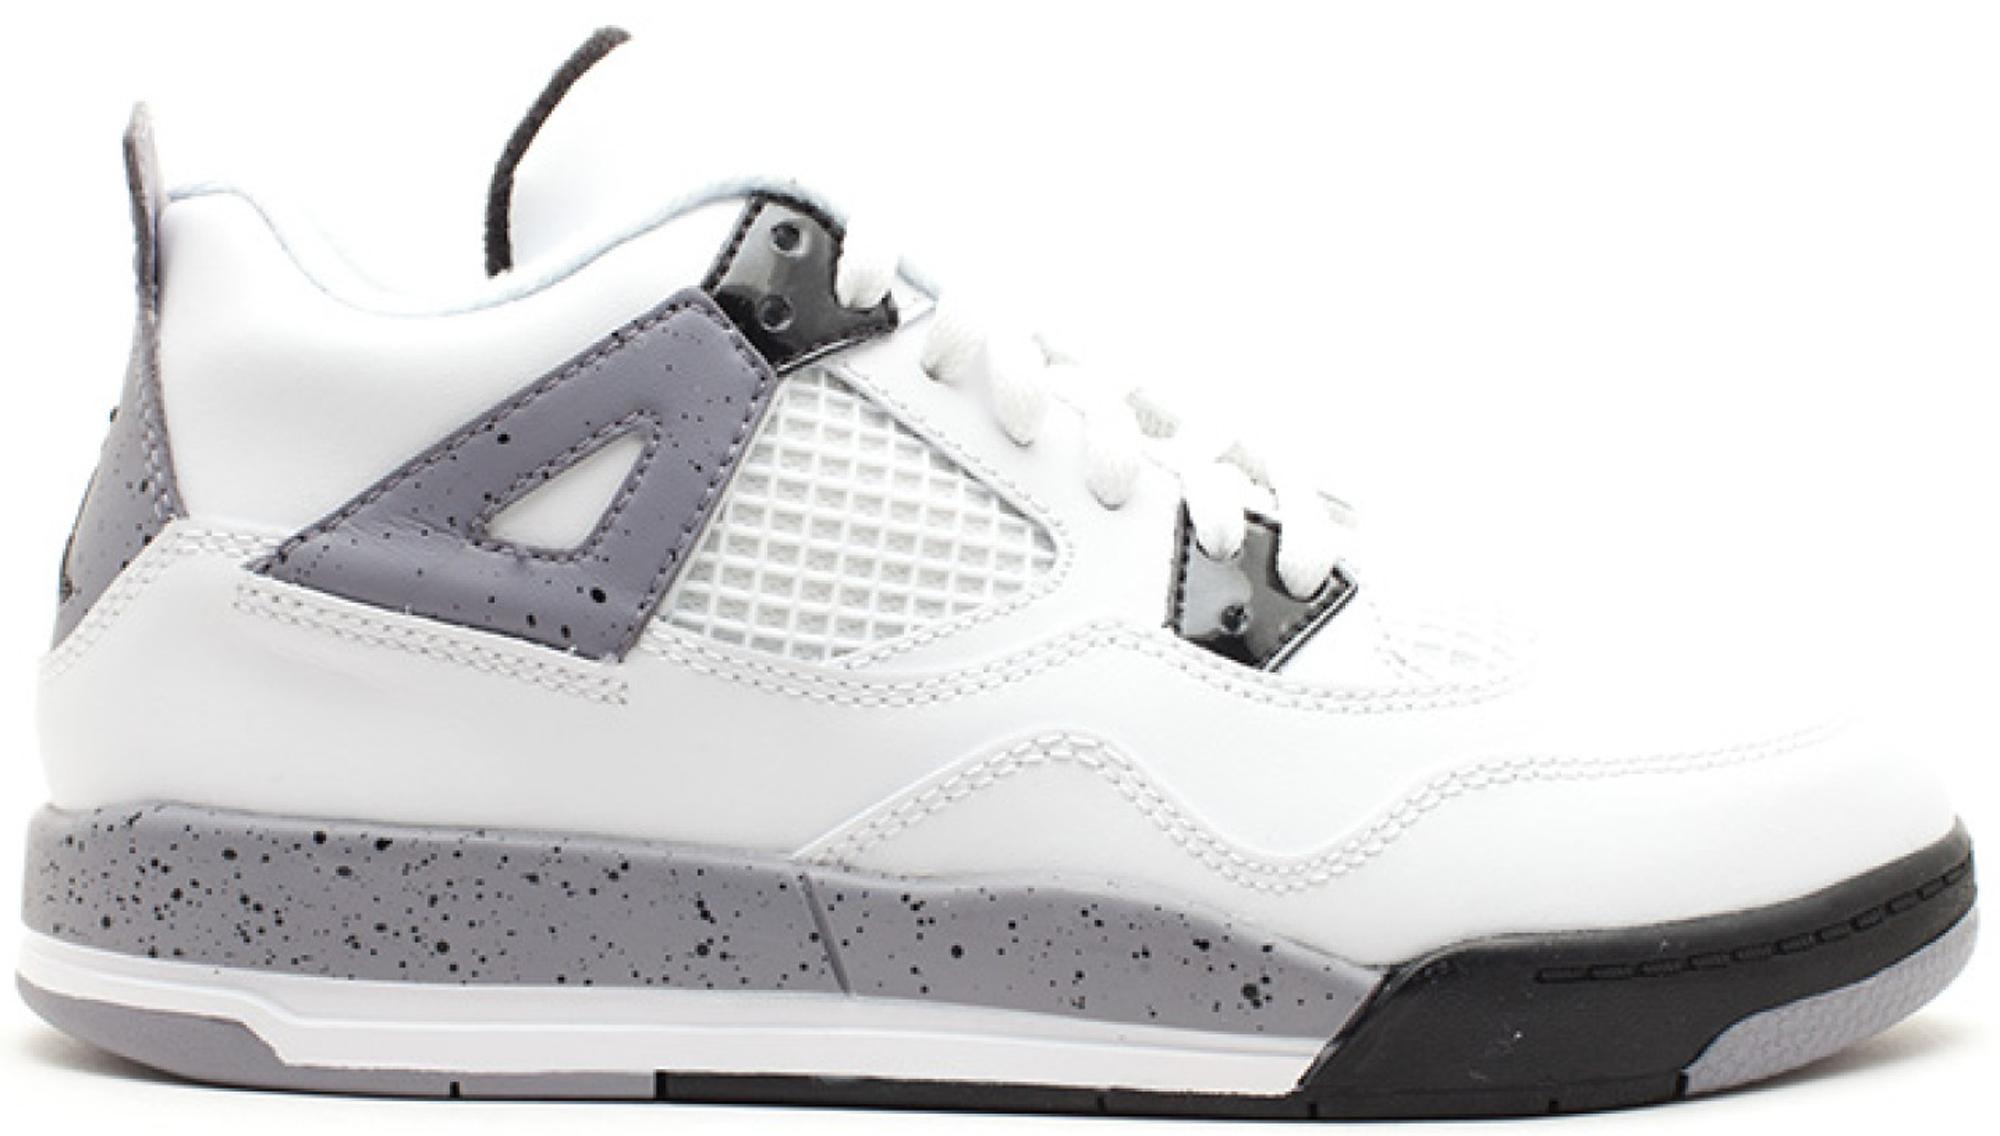 Jordan 4 Retro White Cement 2012 (PS